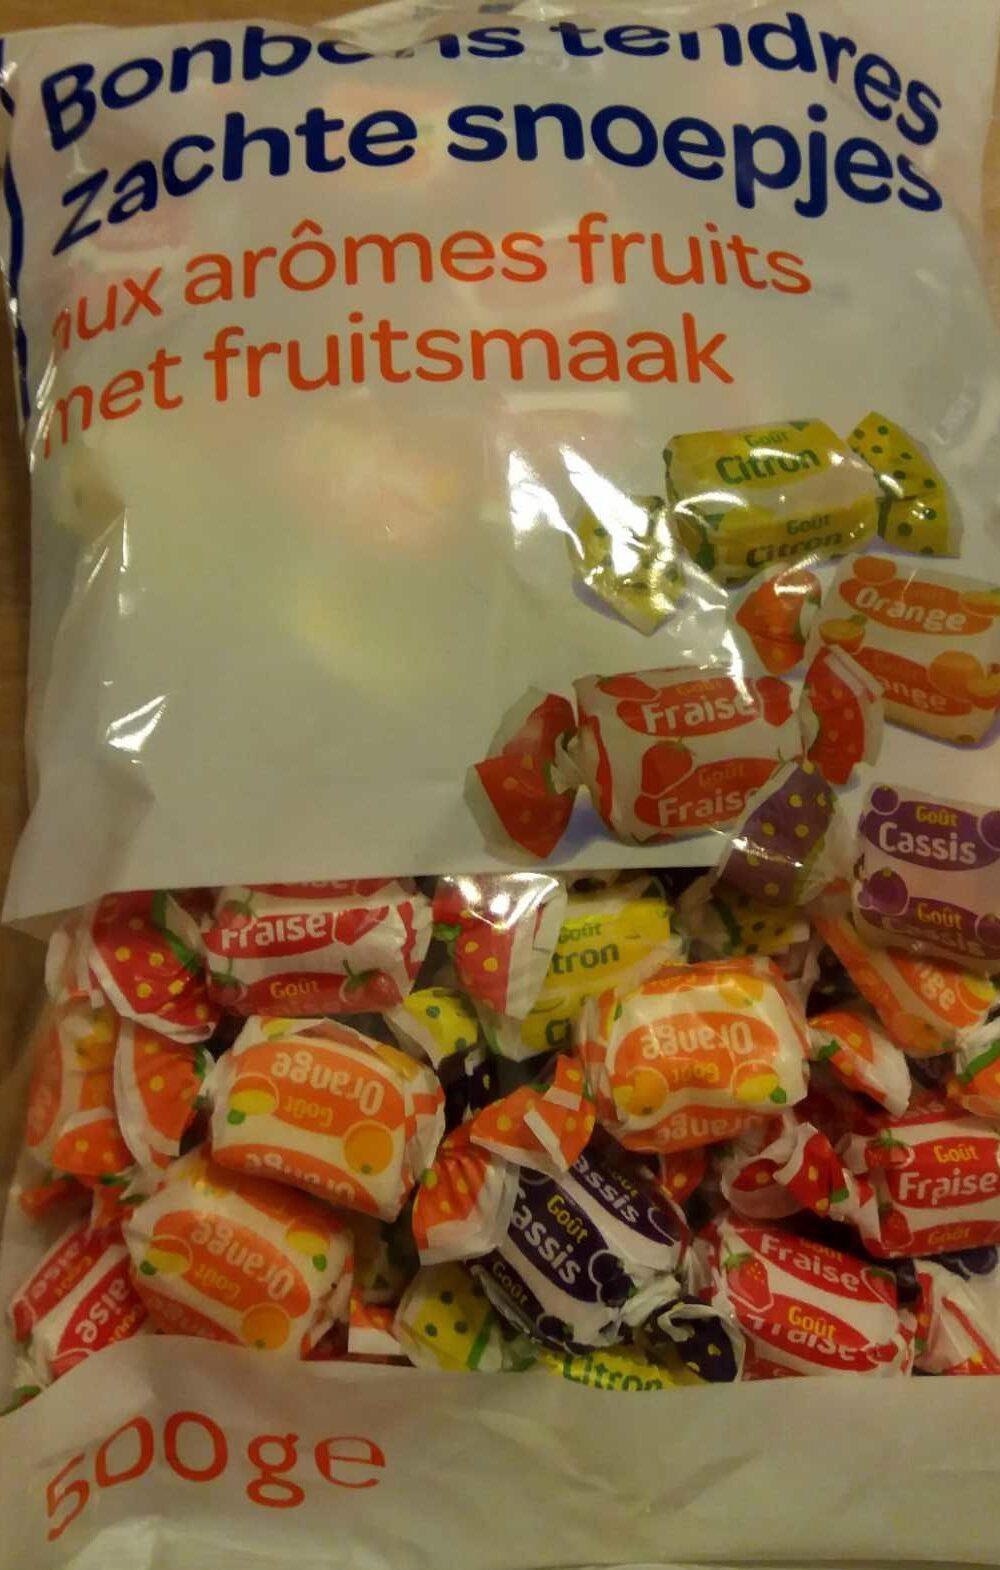 Bonbons tendres Saveurs fruits - Produkt